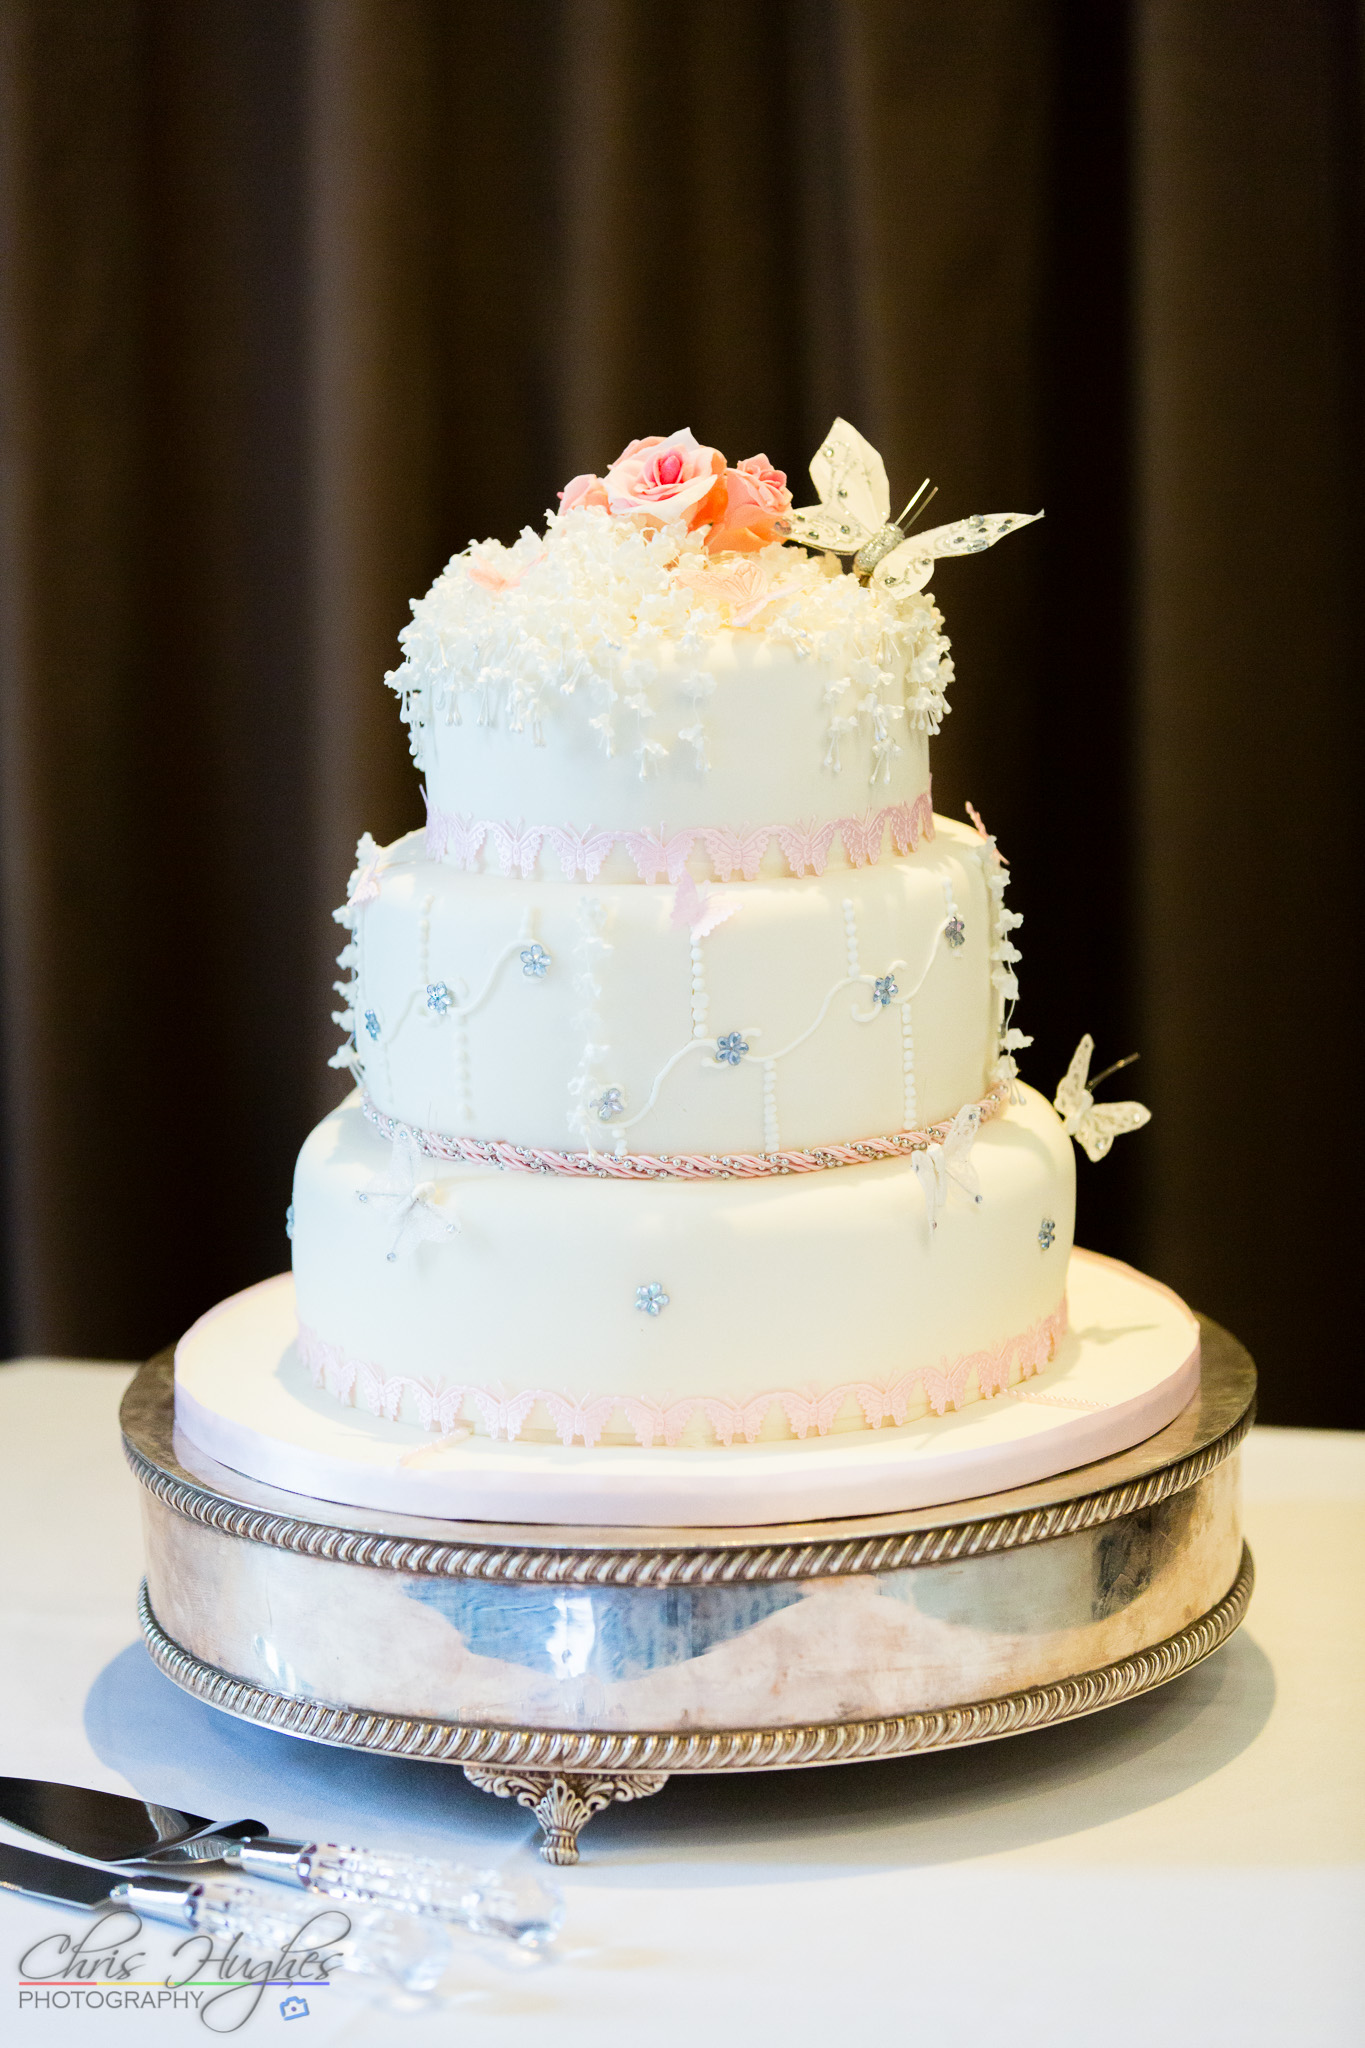 Antony & Becky\'s Wedding at Bowburn Hall - Chris Hughes Photography ...